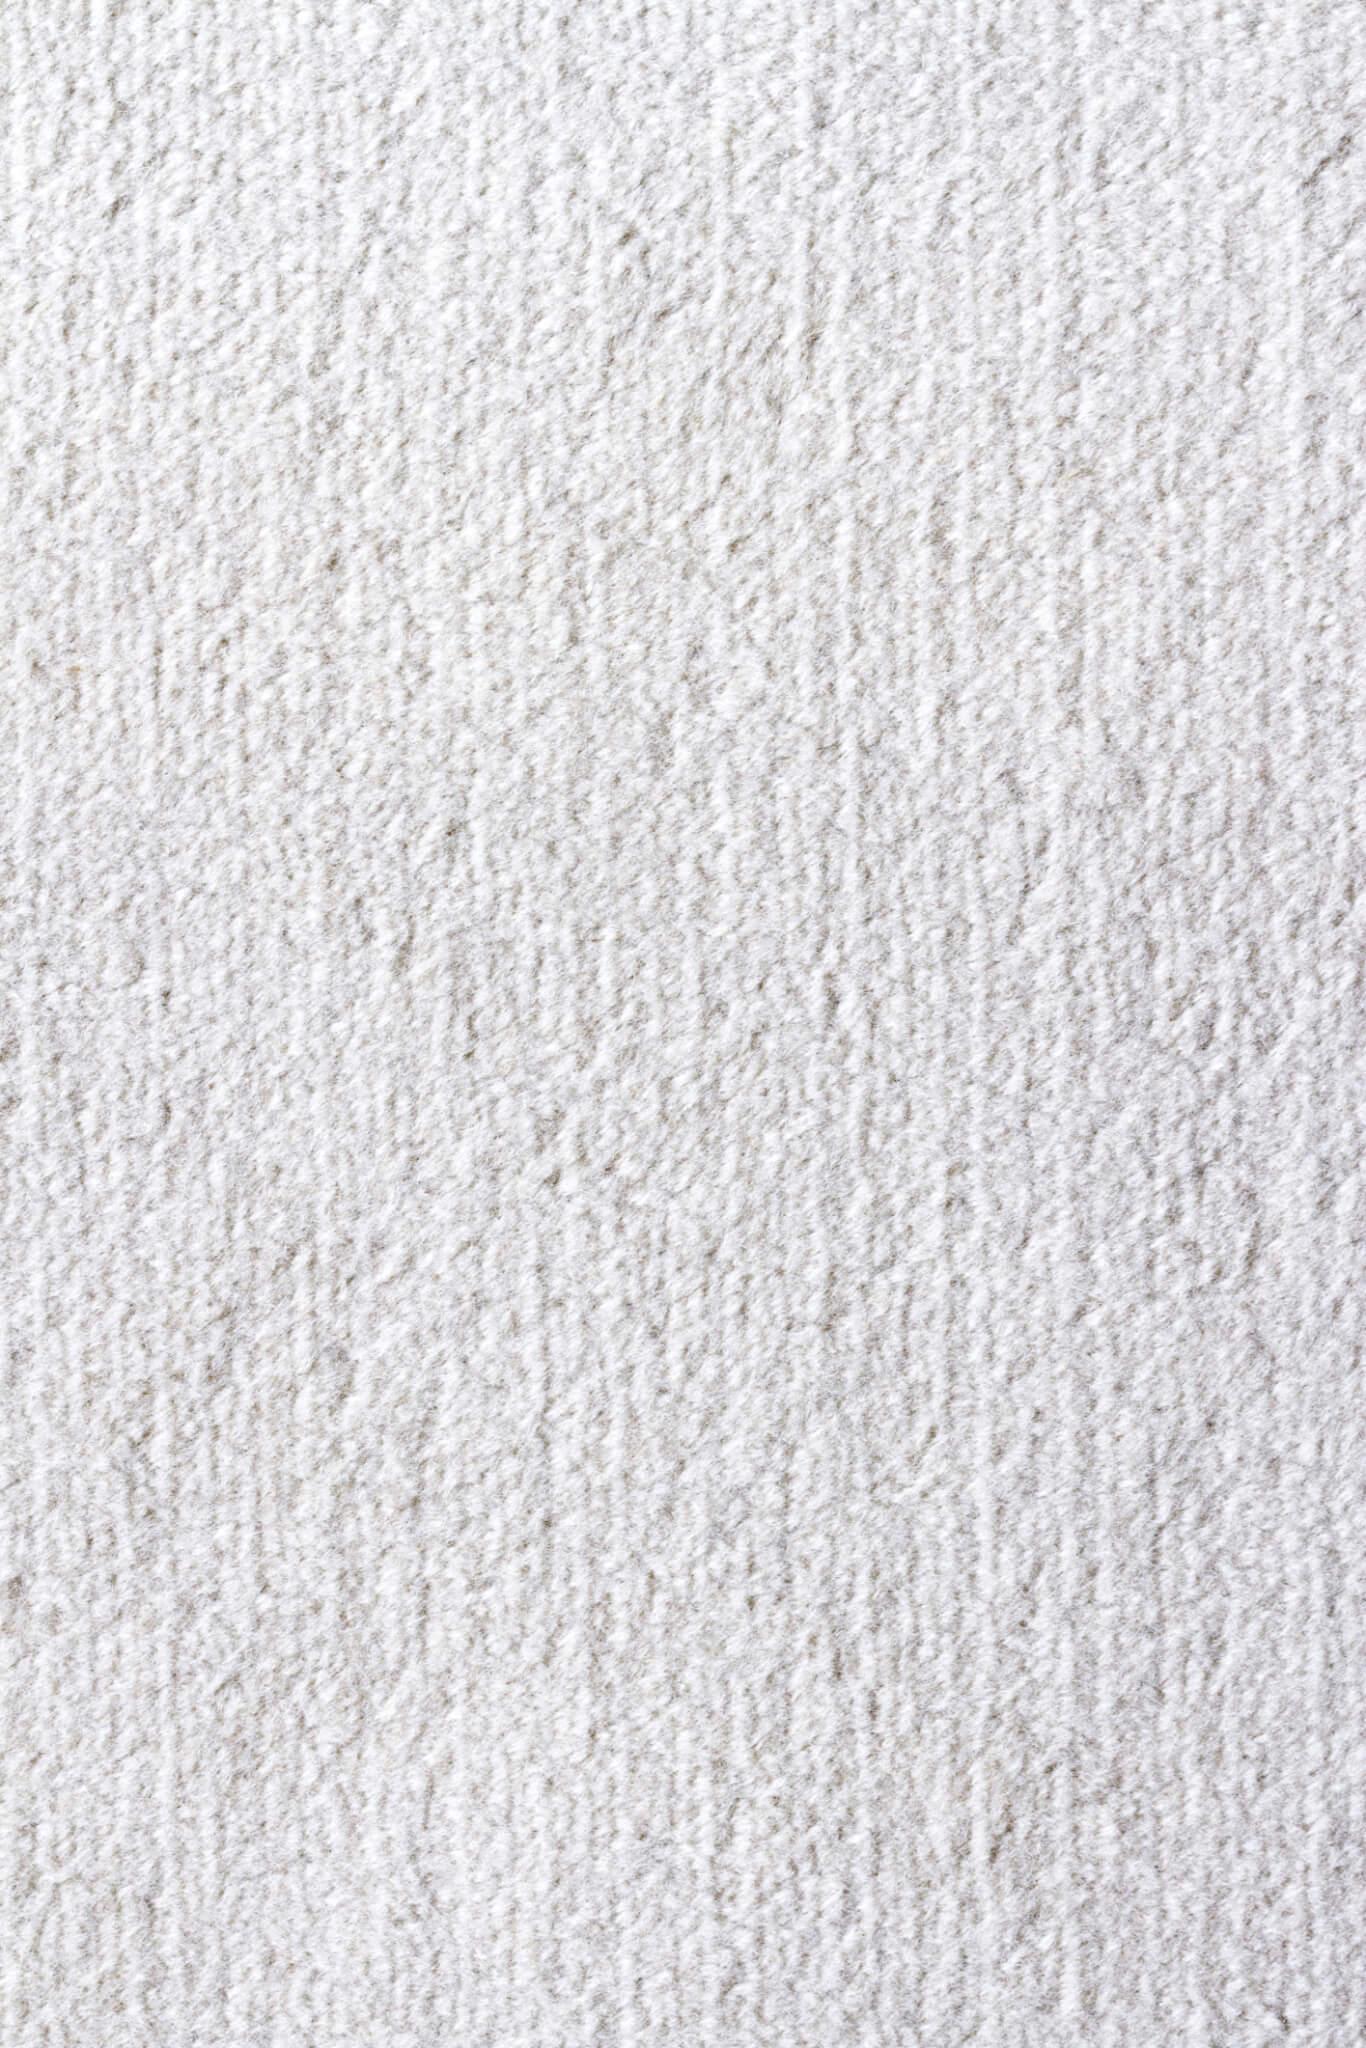 Carpet Gallery Carpet Samples Remnant Carpets Samples